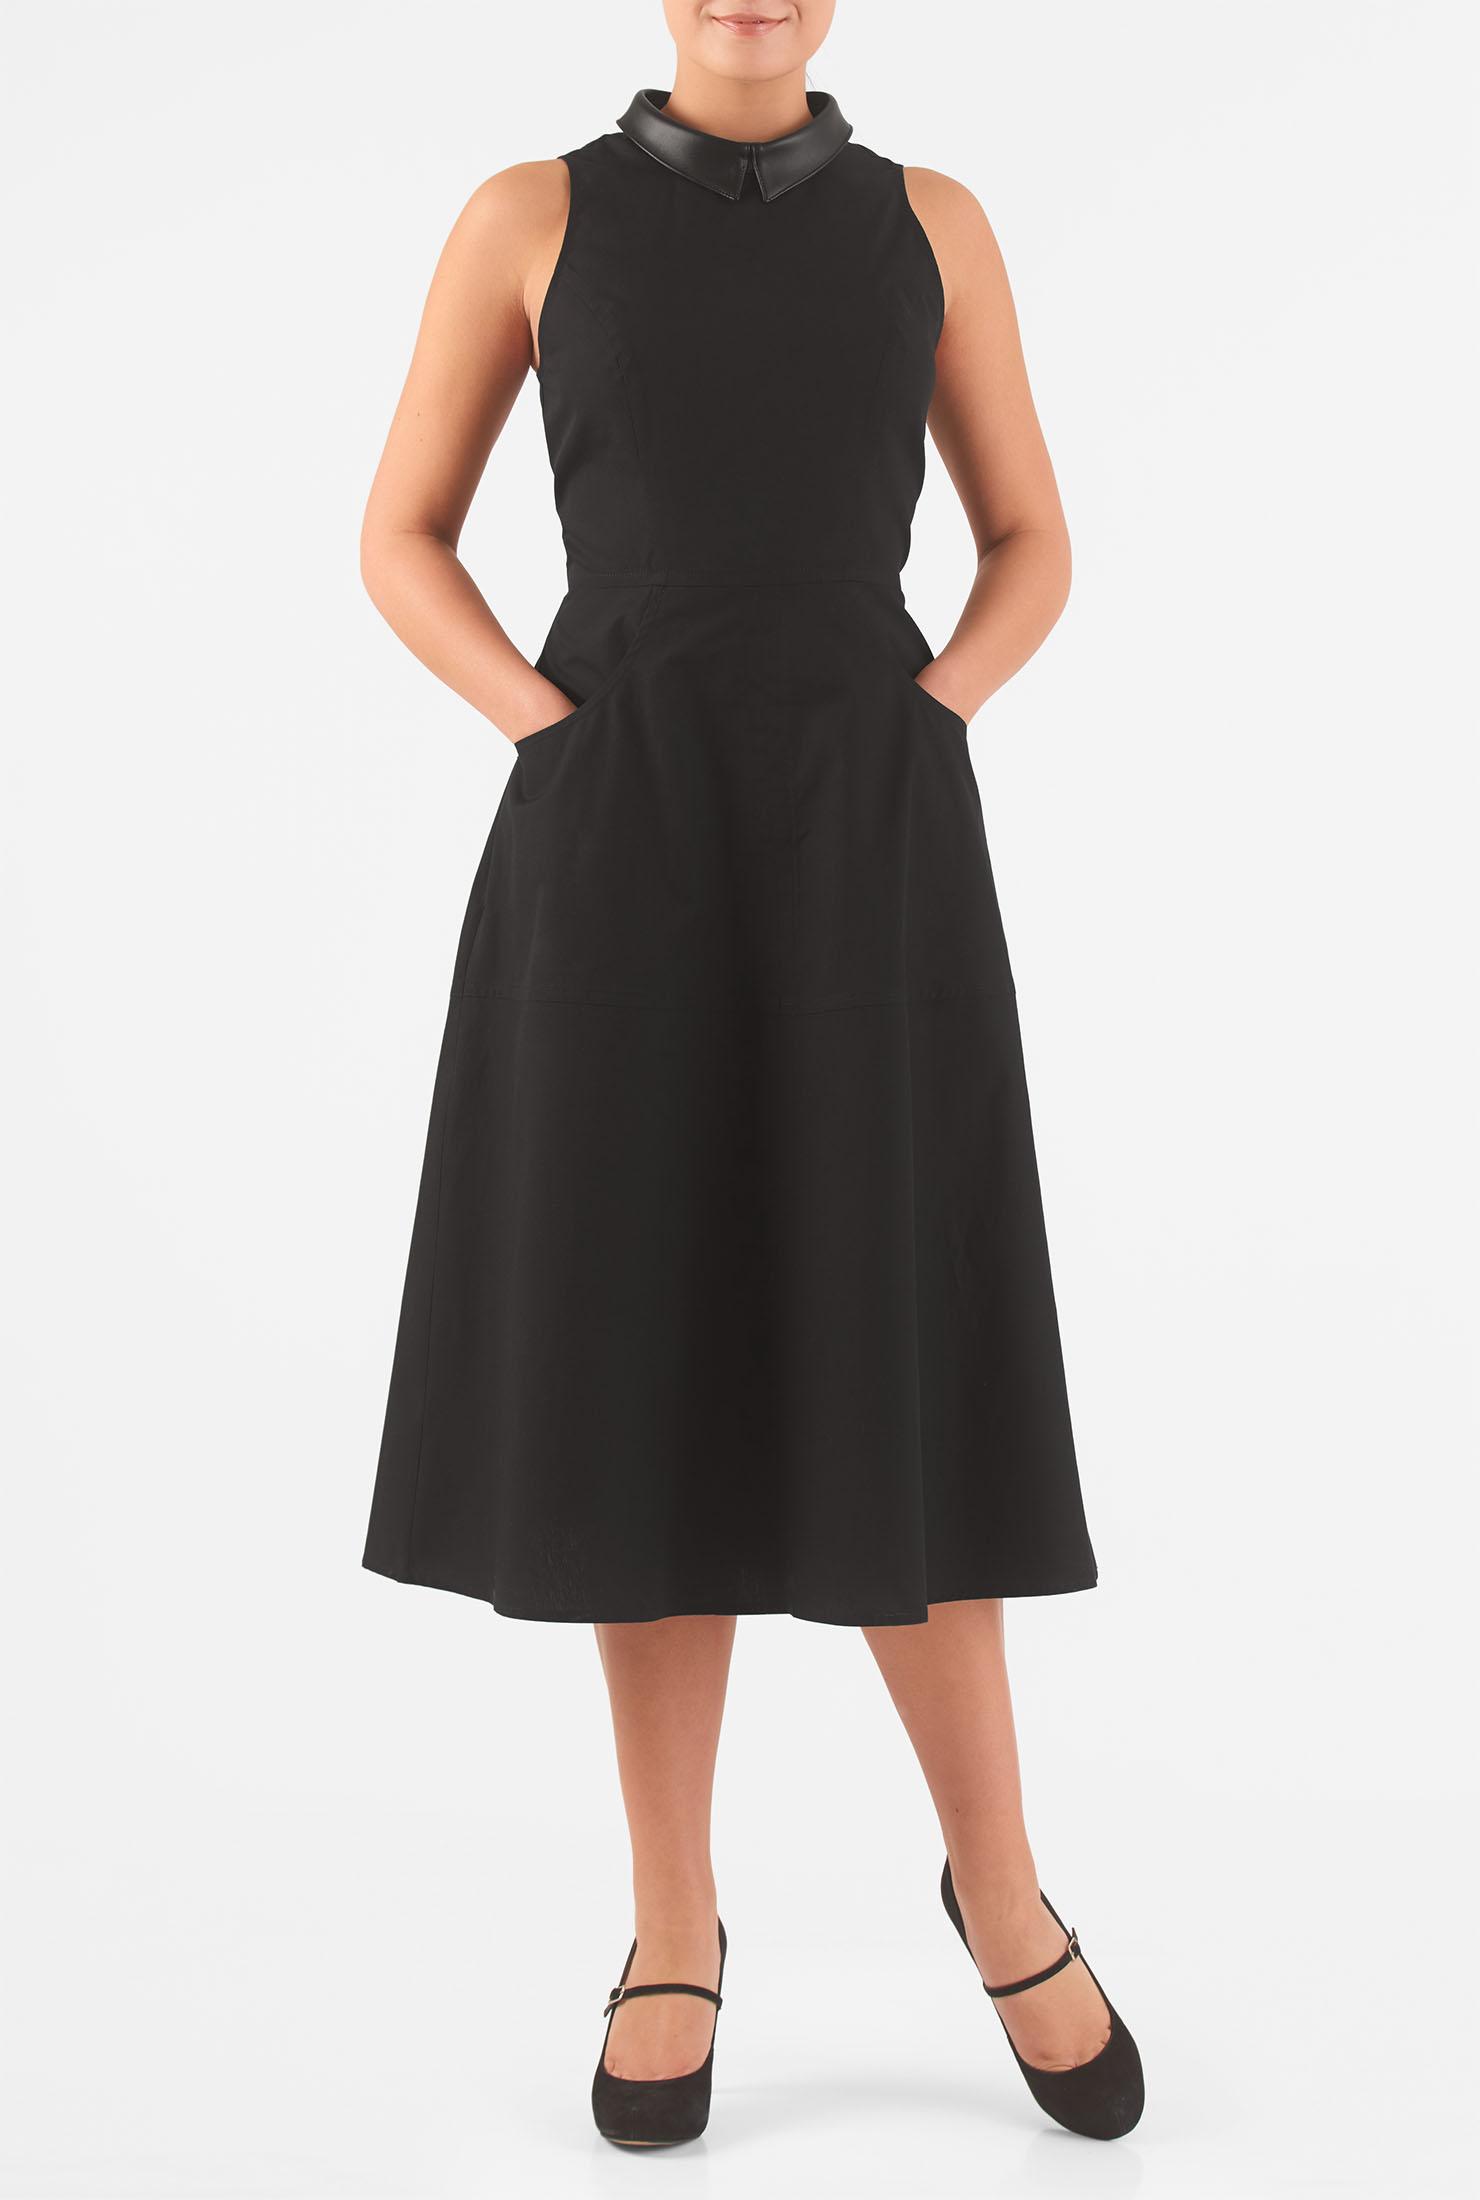 eShakti Women's Faux leather collar poplin midi dress CL0046037